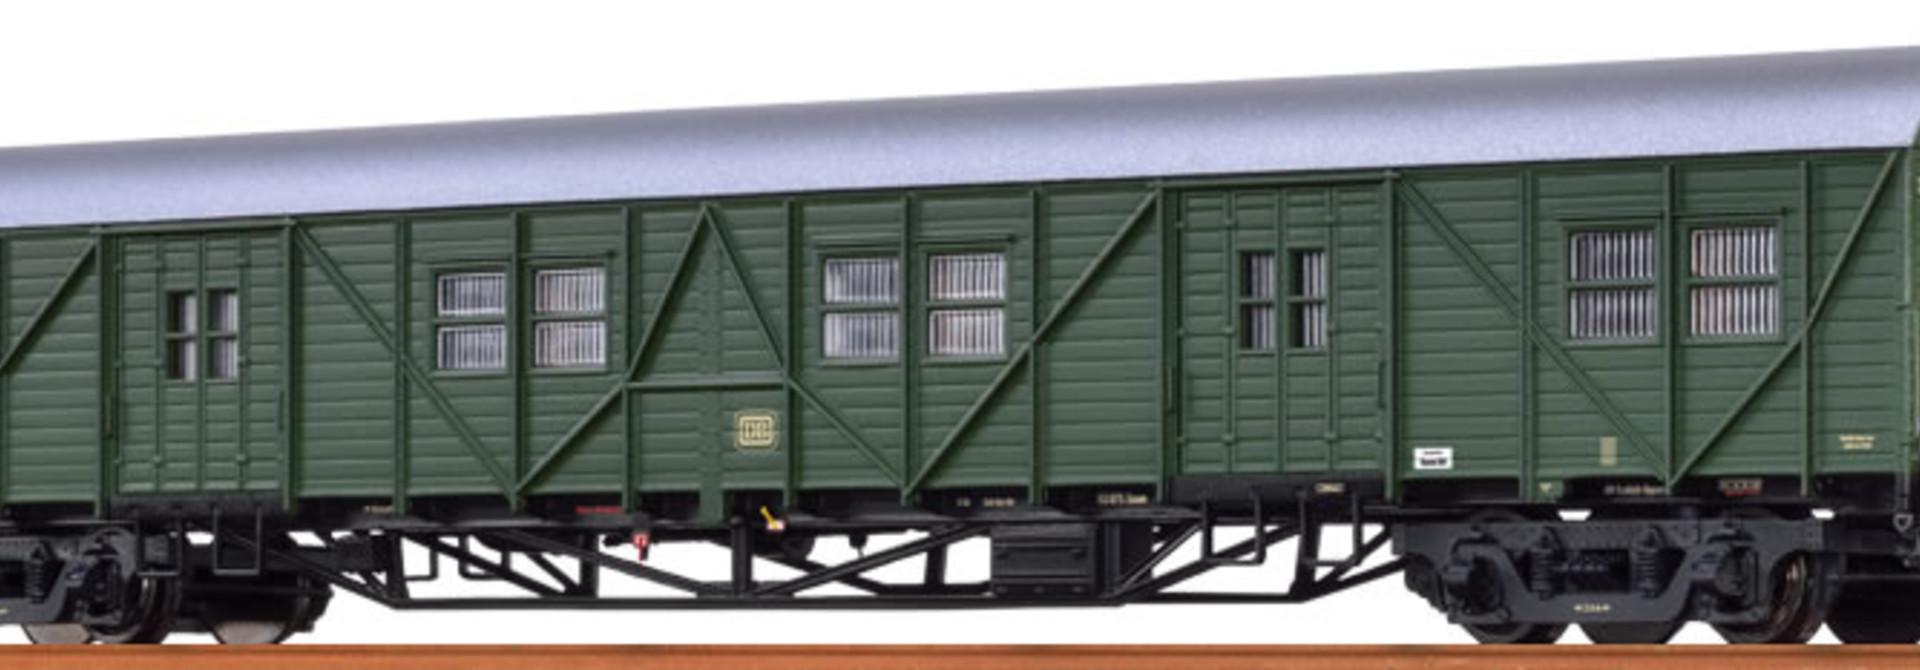 46250 Gepäckwagen MPw4yge DB